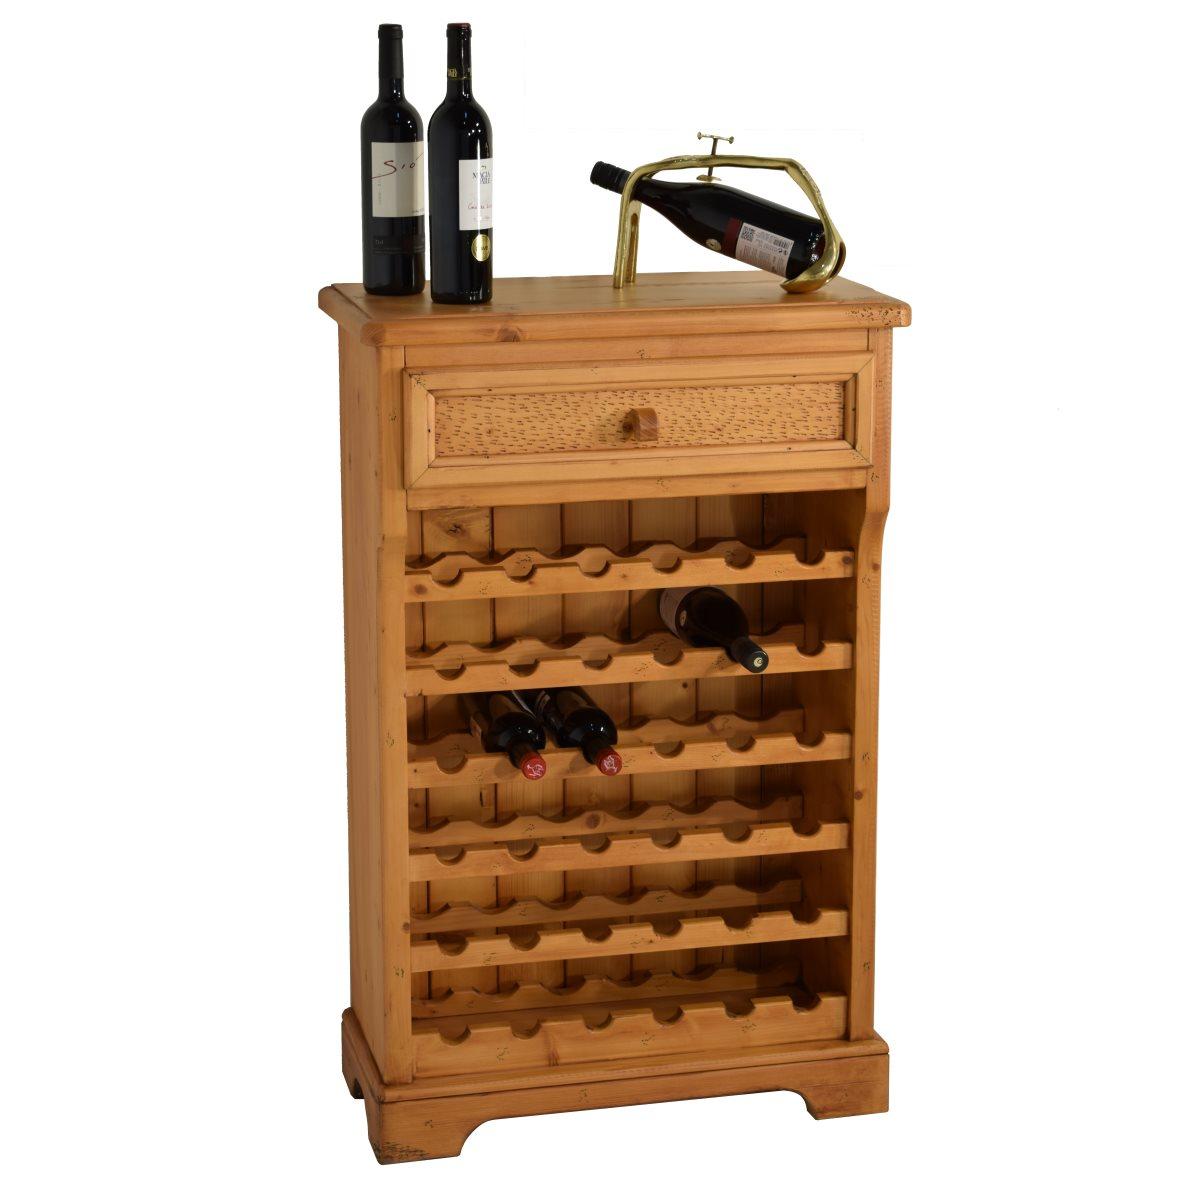 Botellero r stico de madera ecor stico venta de muebles - Botellero de madera para vino ...